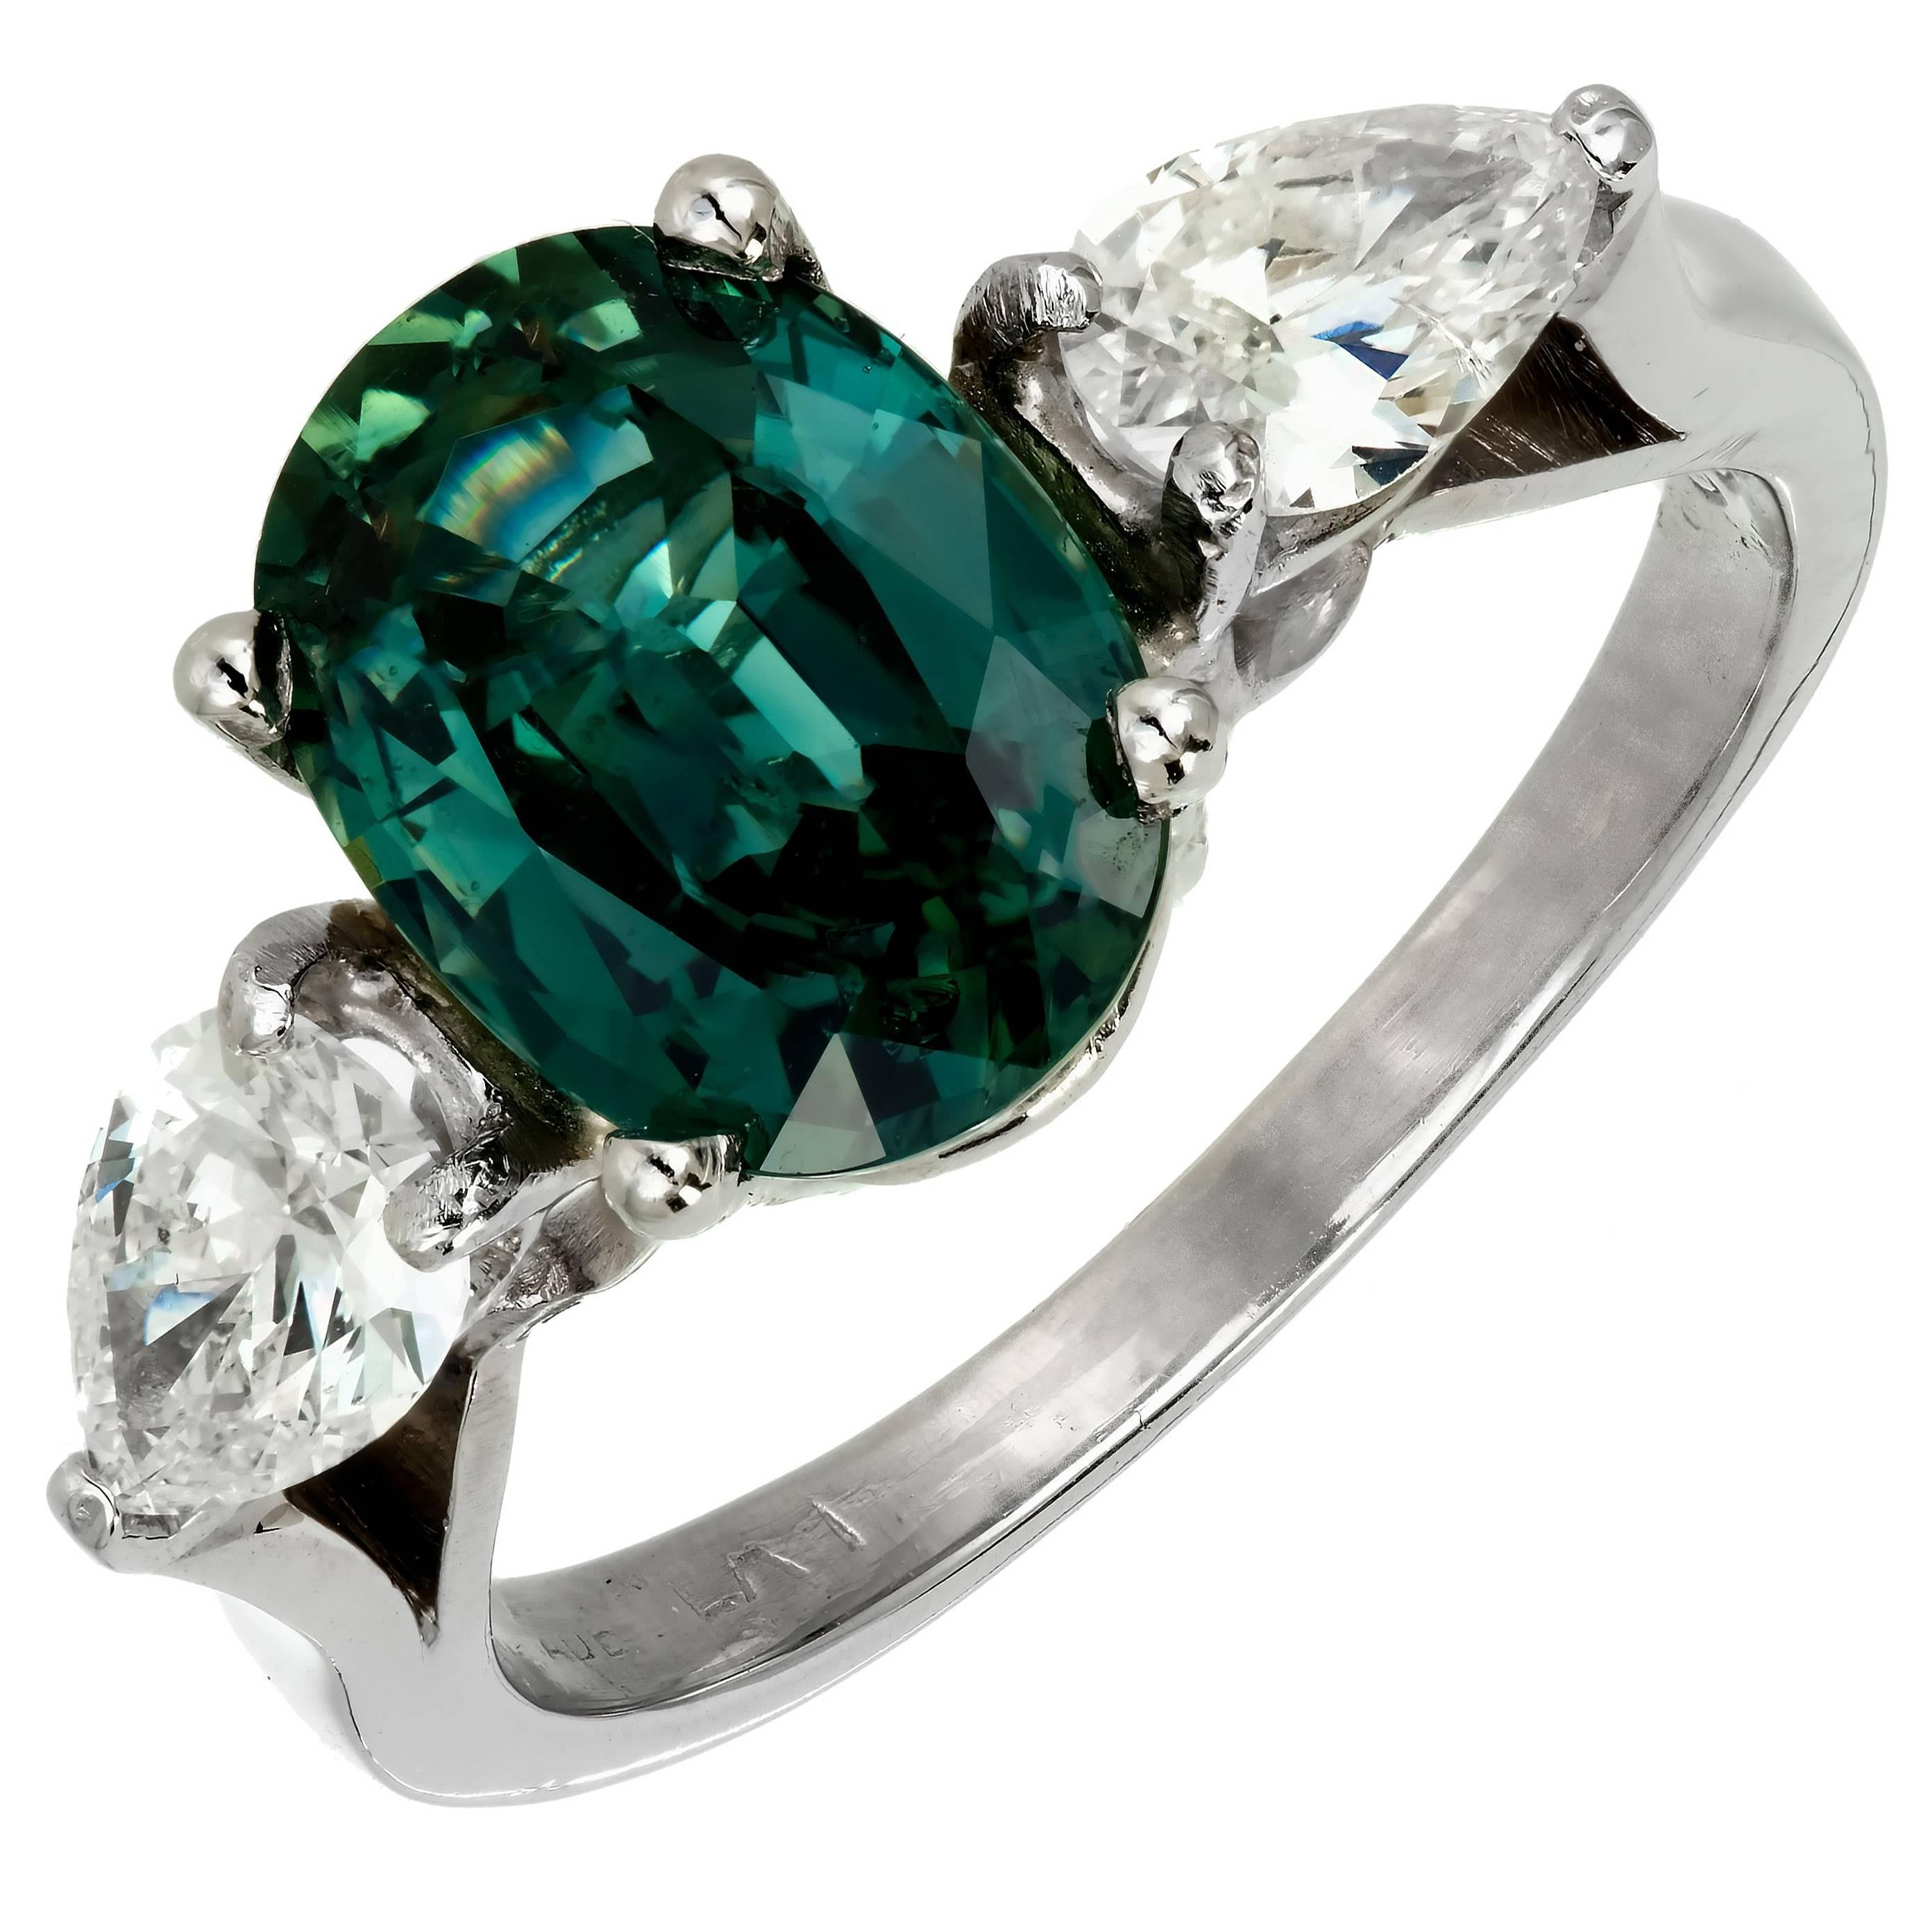 GIA Certified 2.86 Carat Green Natural Sapphire Diamond Platinum Engagement Ring